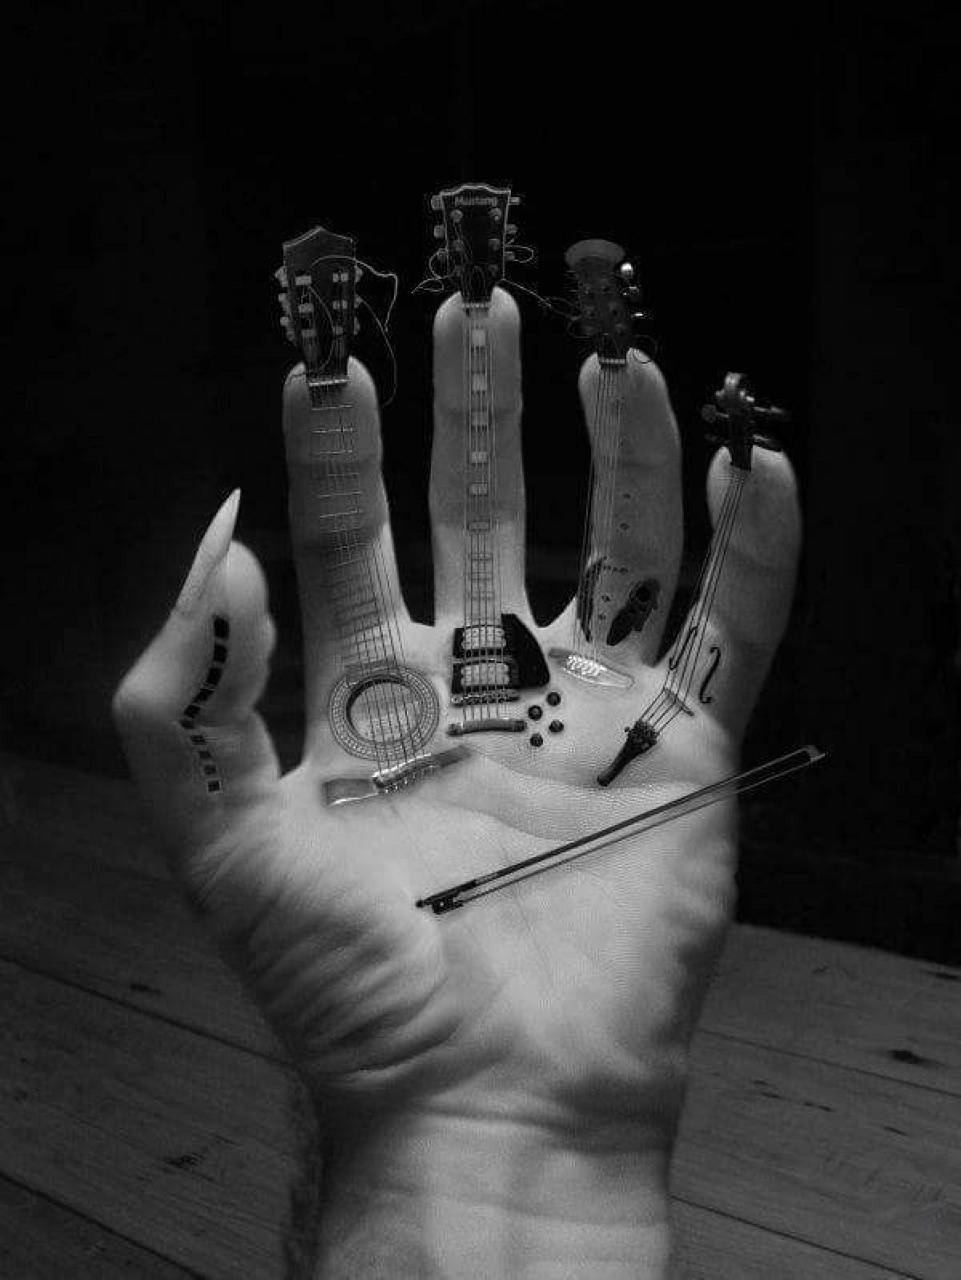 Guitarist Finger